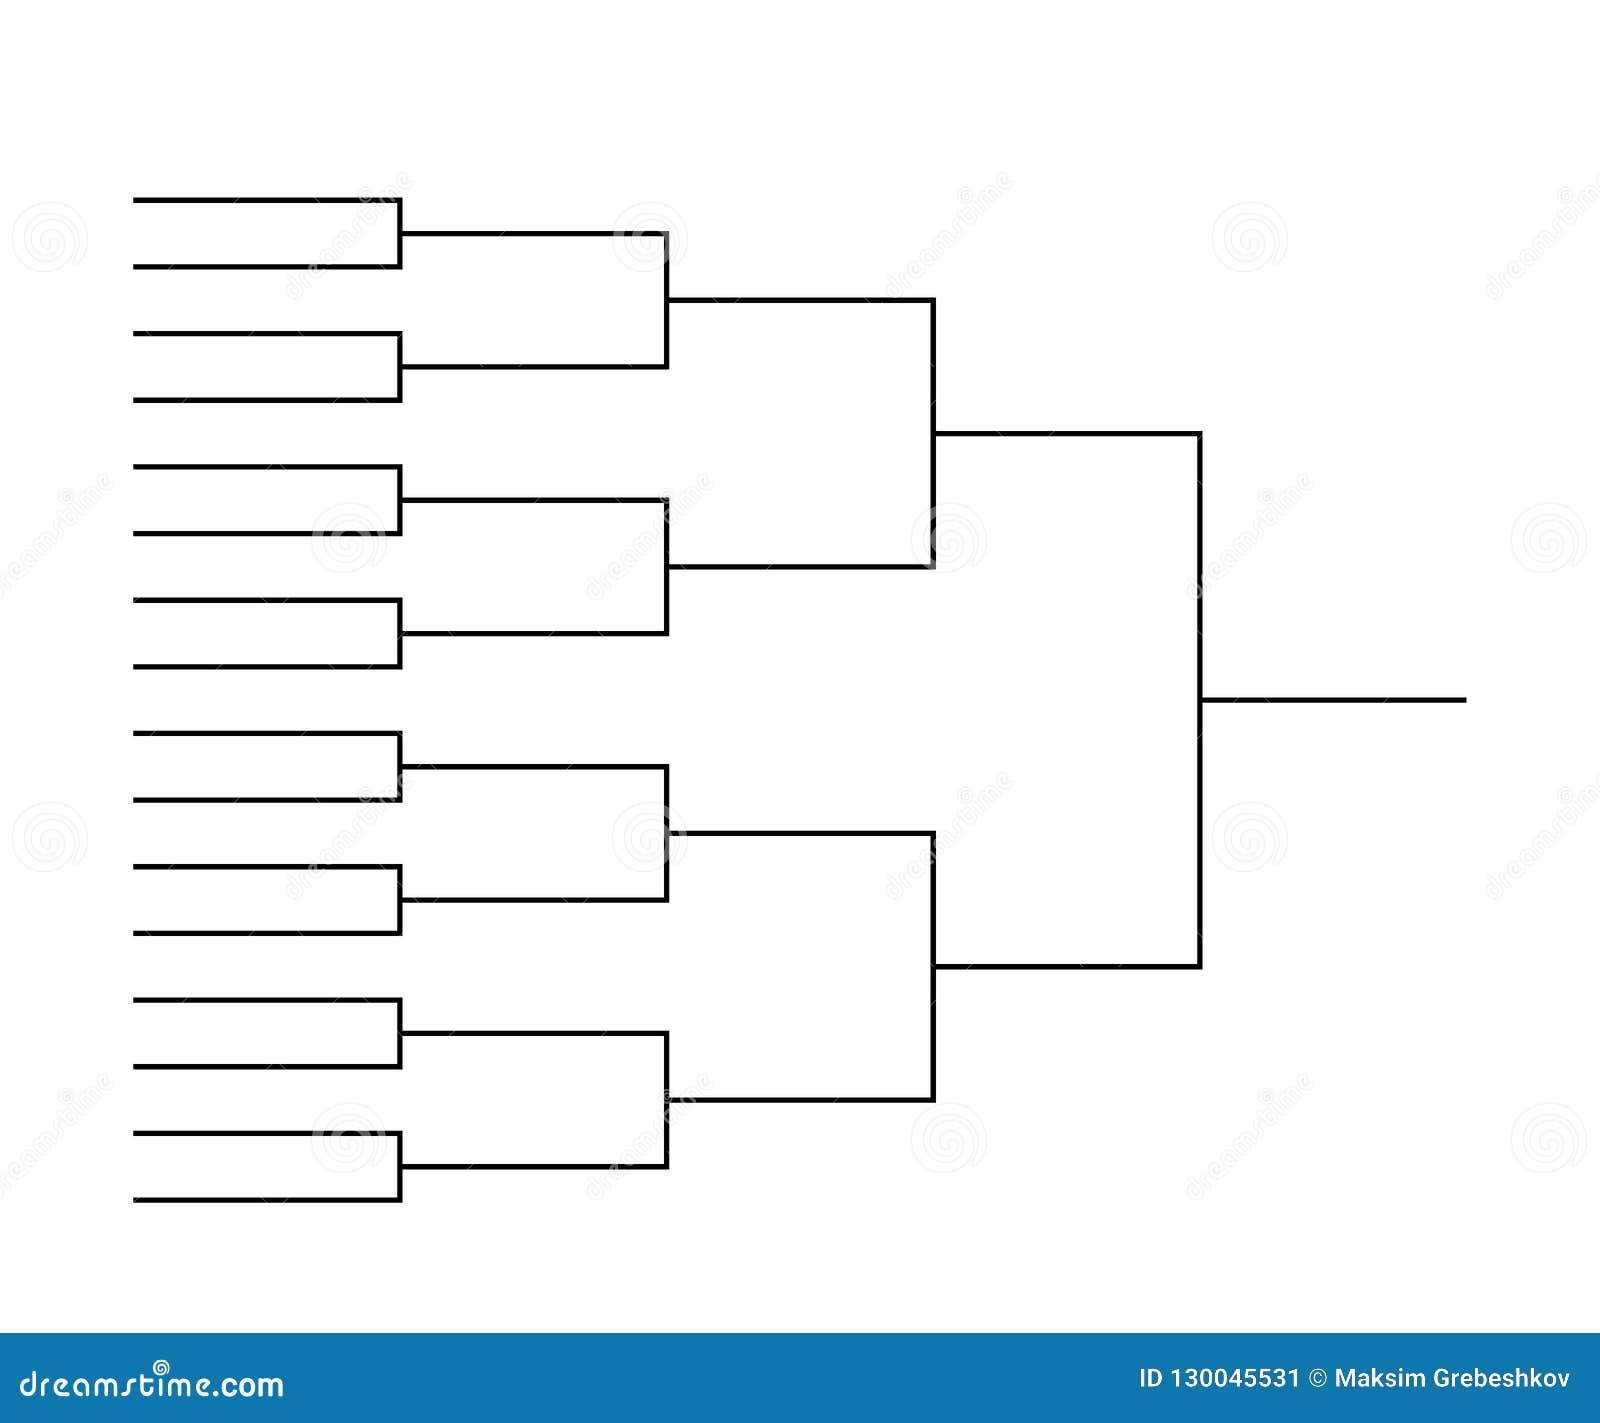 Tournament Schedule Templates Suzen Rabionetassociats Com